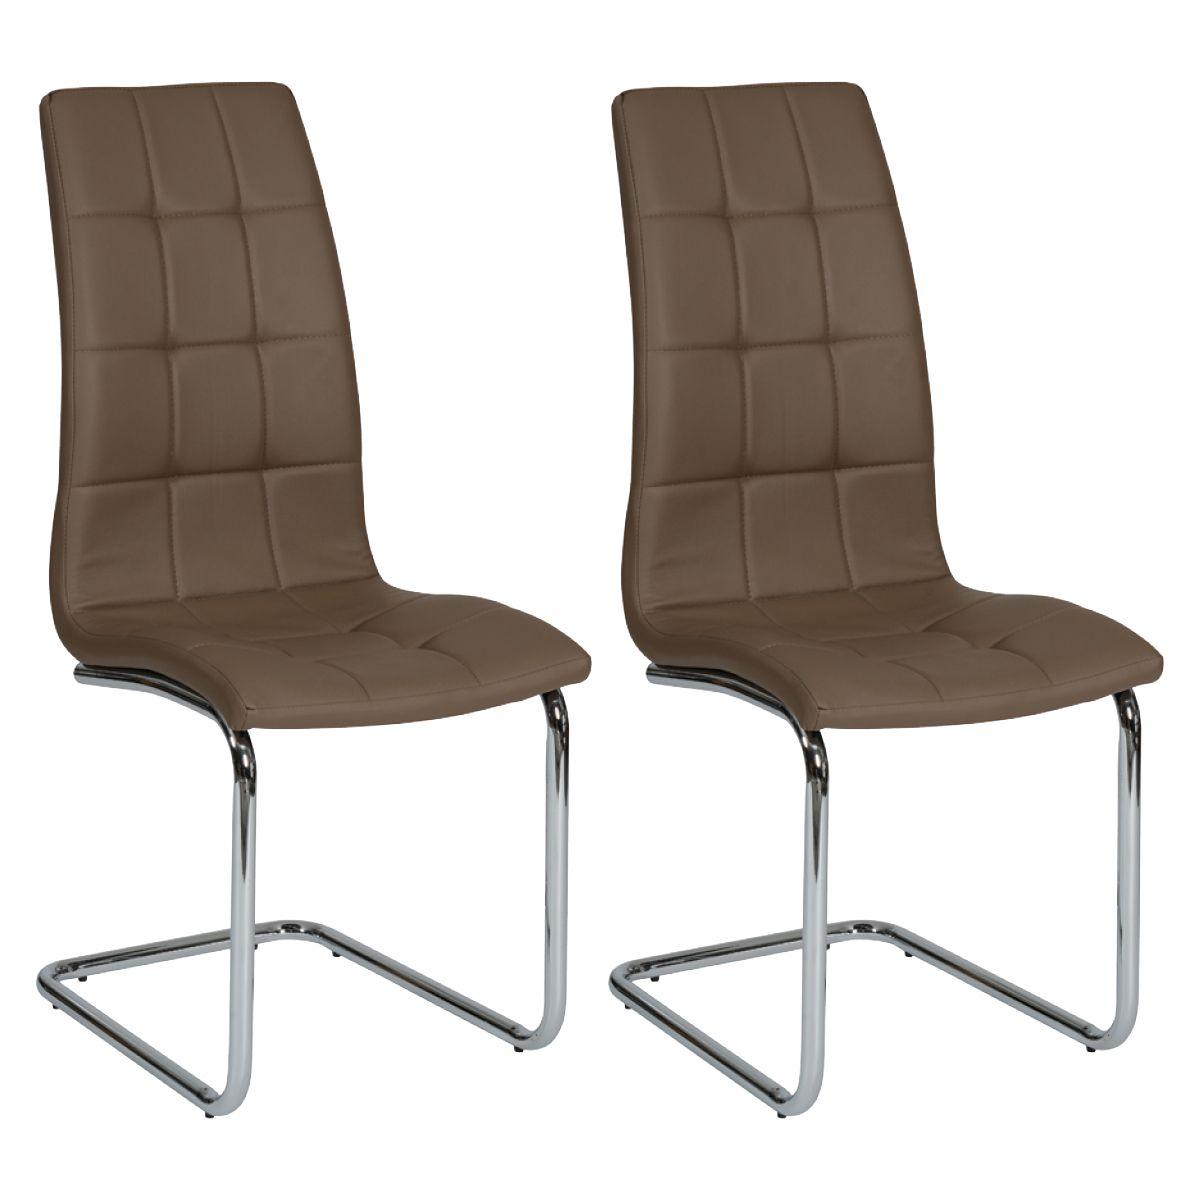 altobuy cally lot de 2 chaises moka neuf ebay. Black Bedroom Furniture Sets. Home Design Ideas